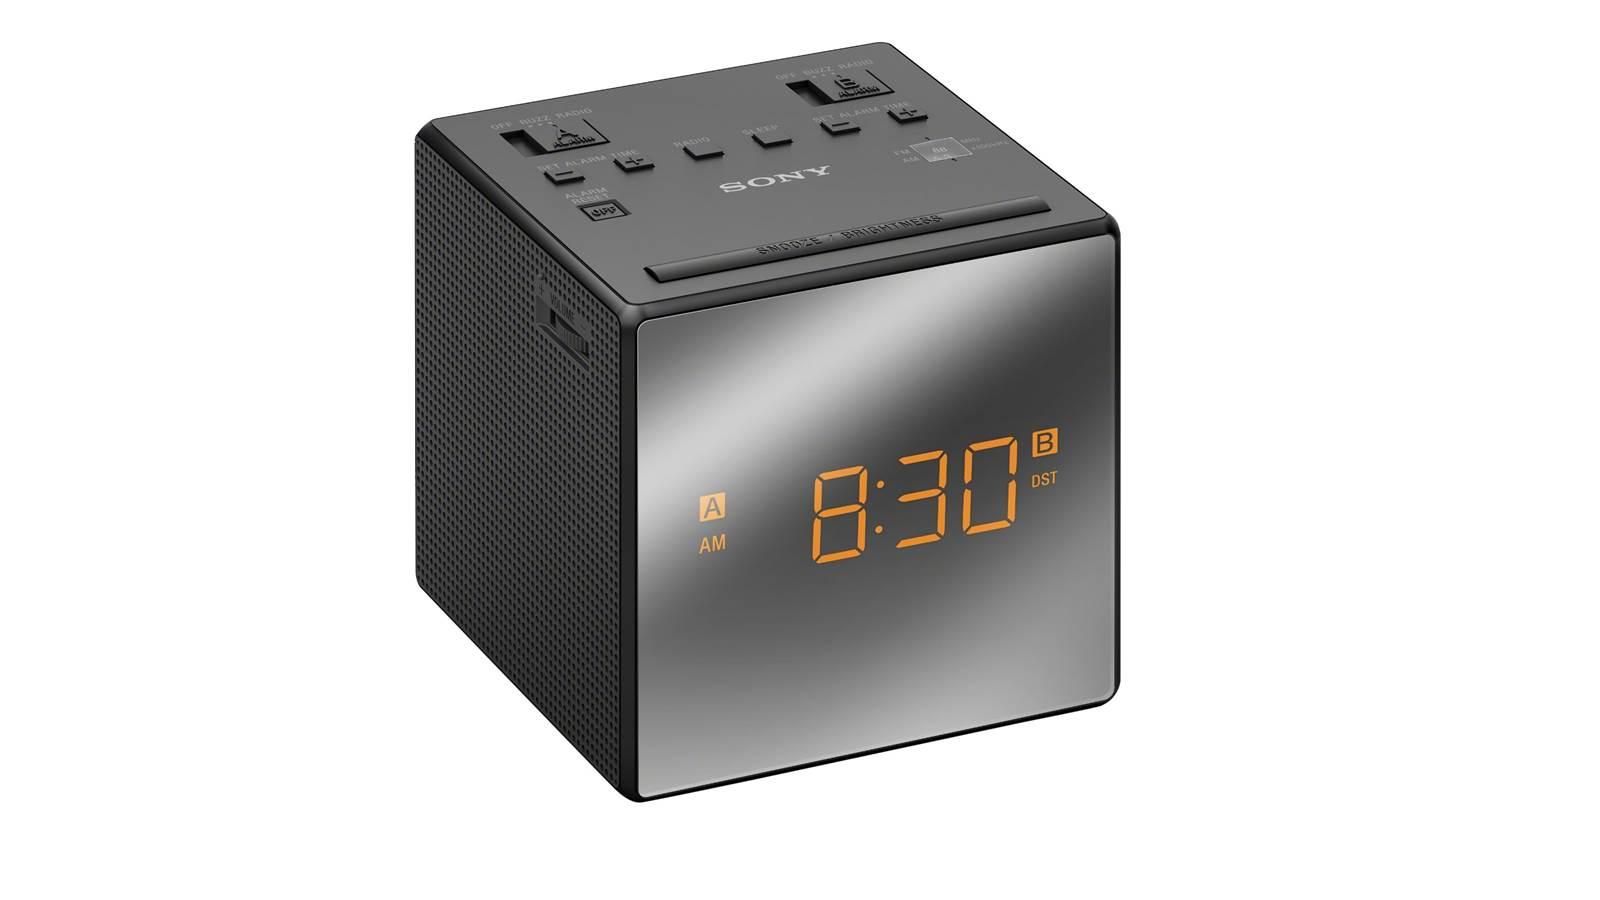 sony icfc1t alarm clock radio black harvey norman malaysia. Black Bedroom Furniture Sets. Home Design Ideas